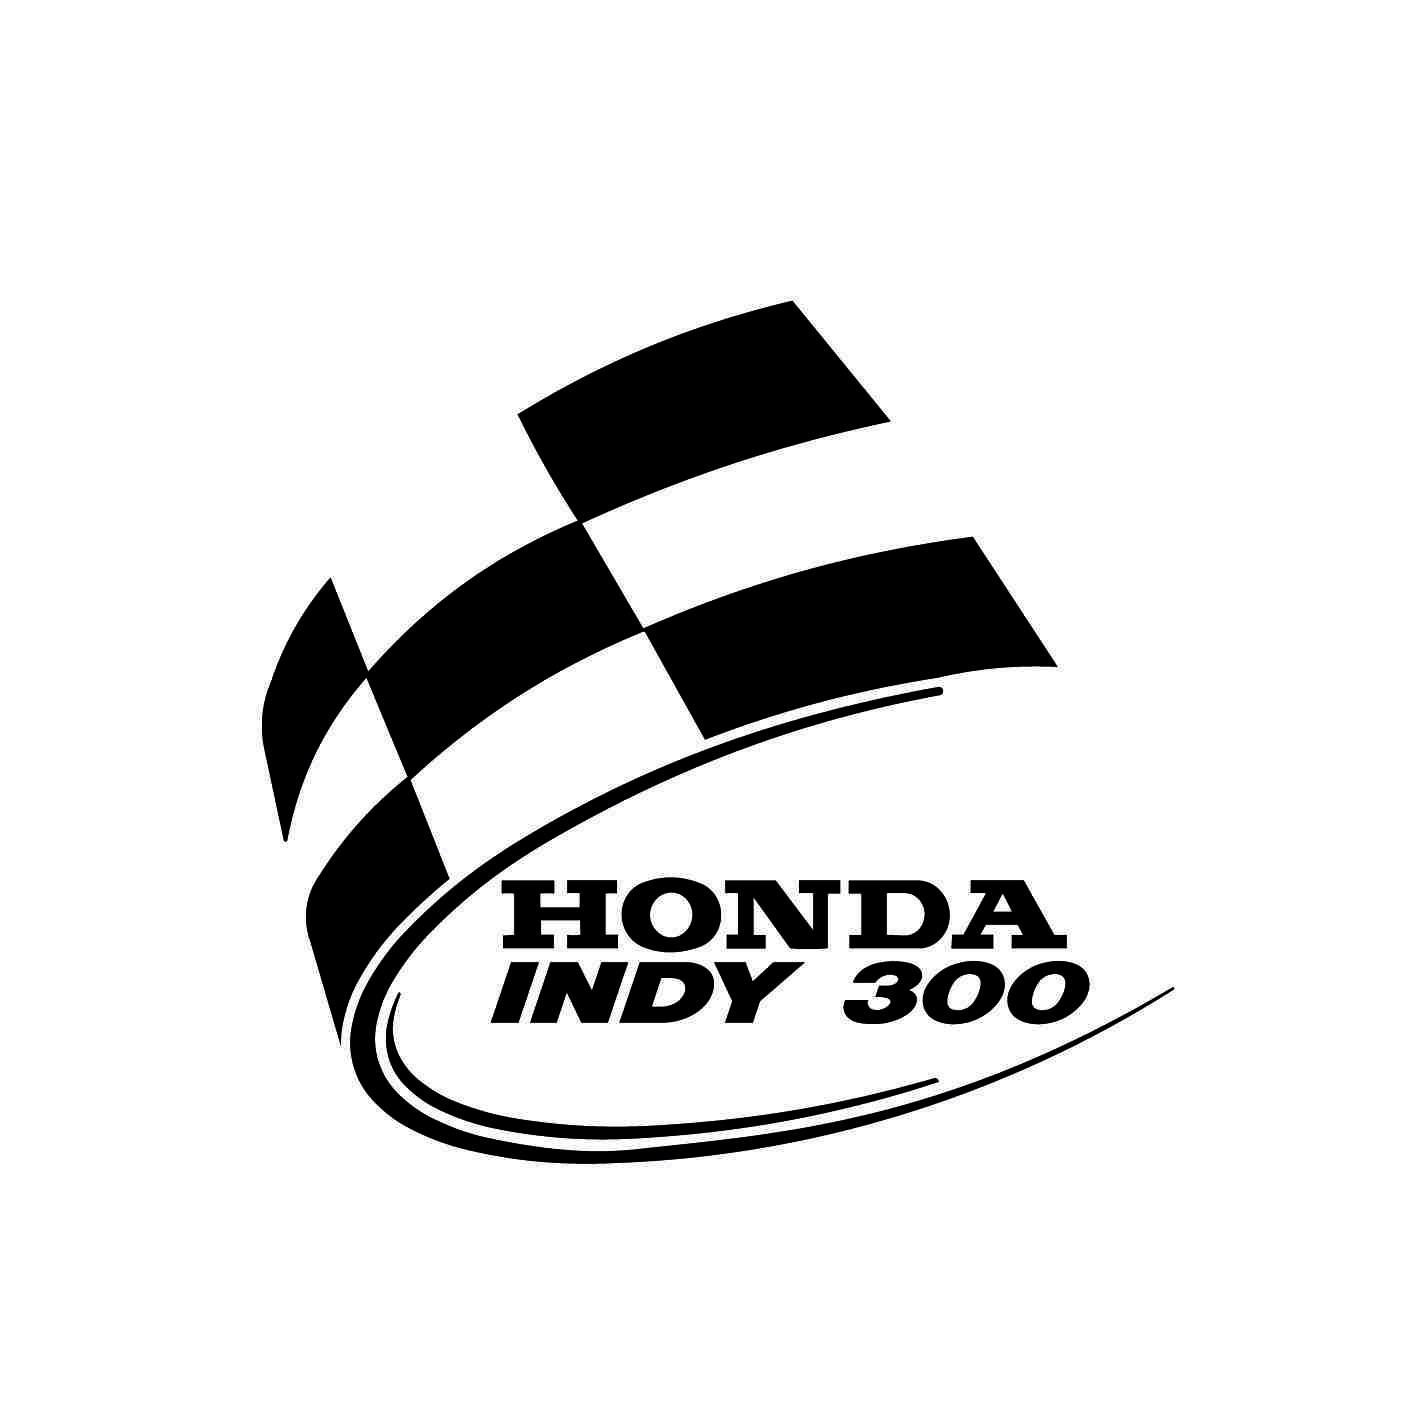 Stickers honda indy 300 autocollant moto